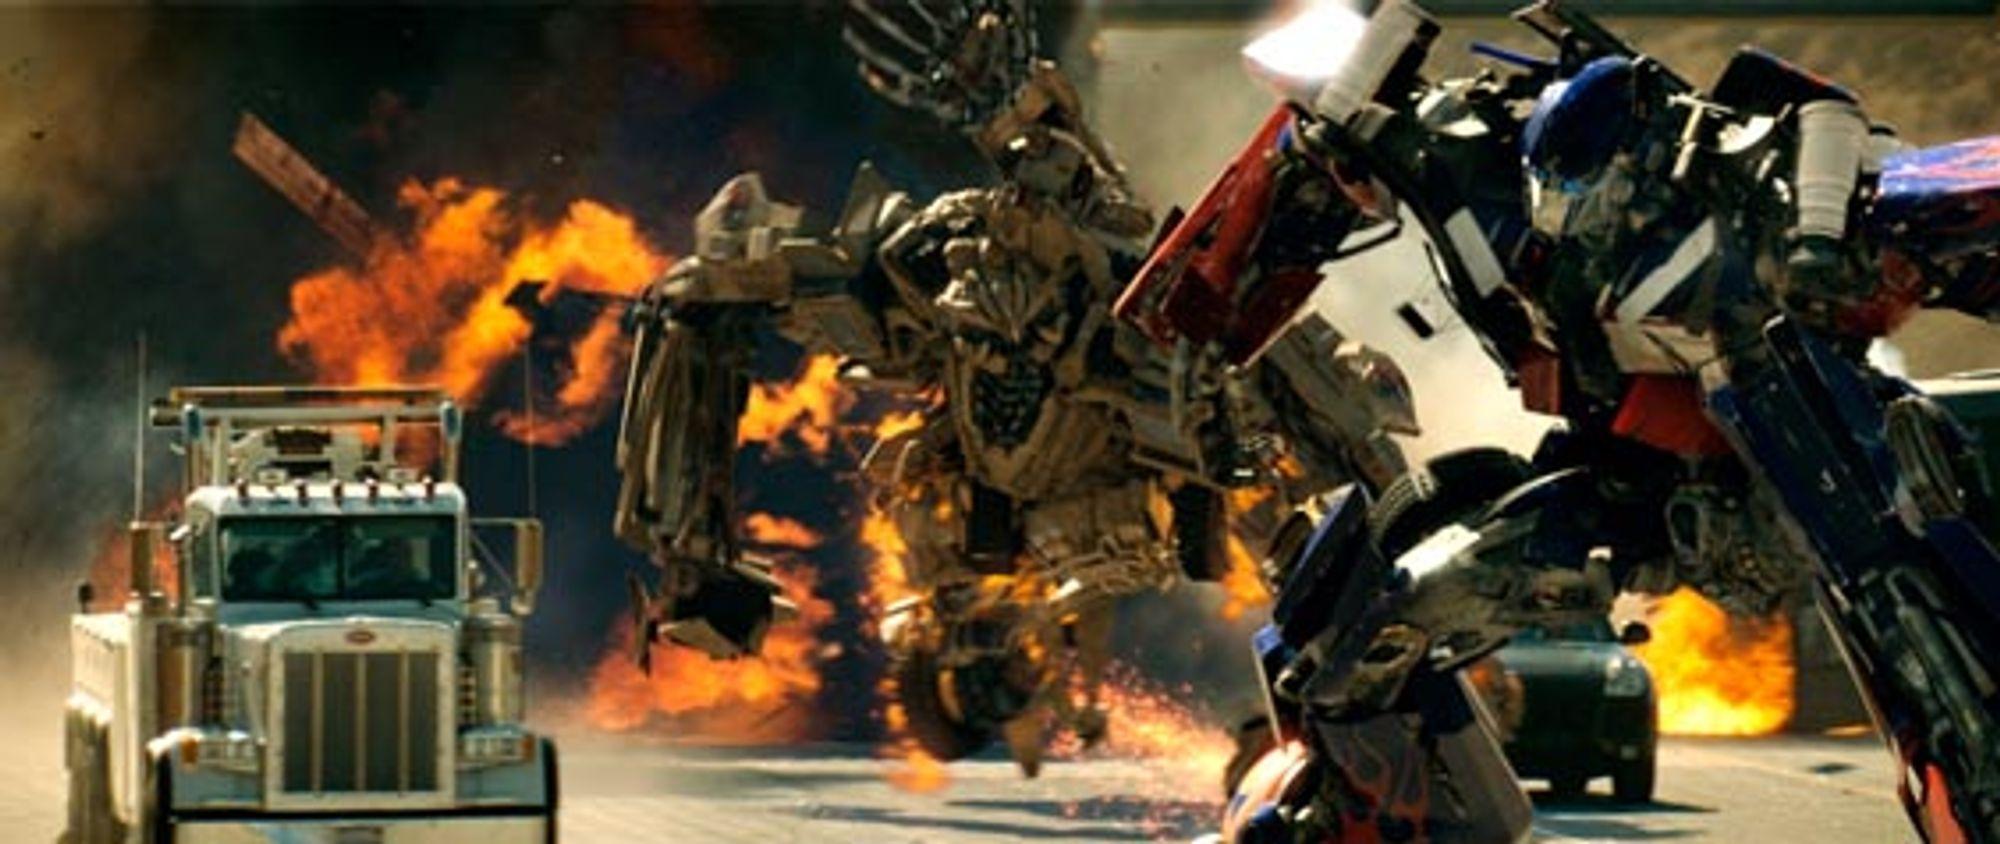 Optimus Prime i angrepsposisjon.